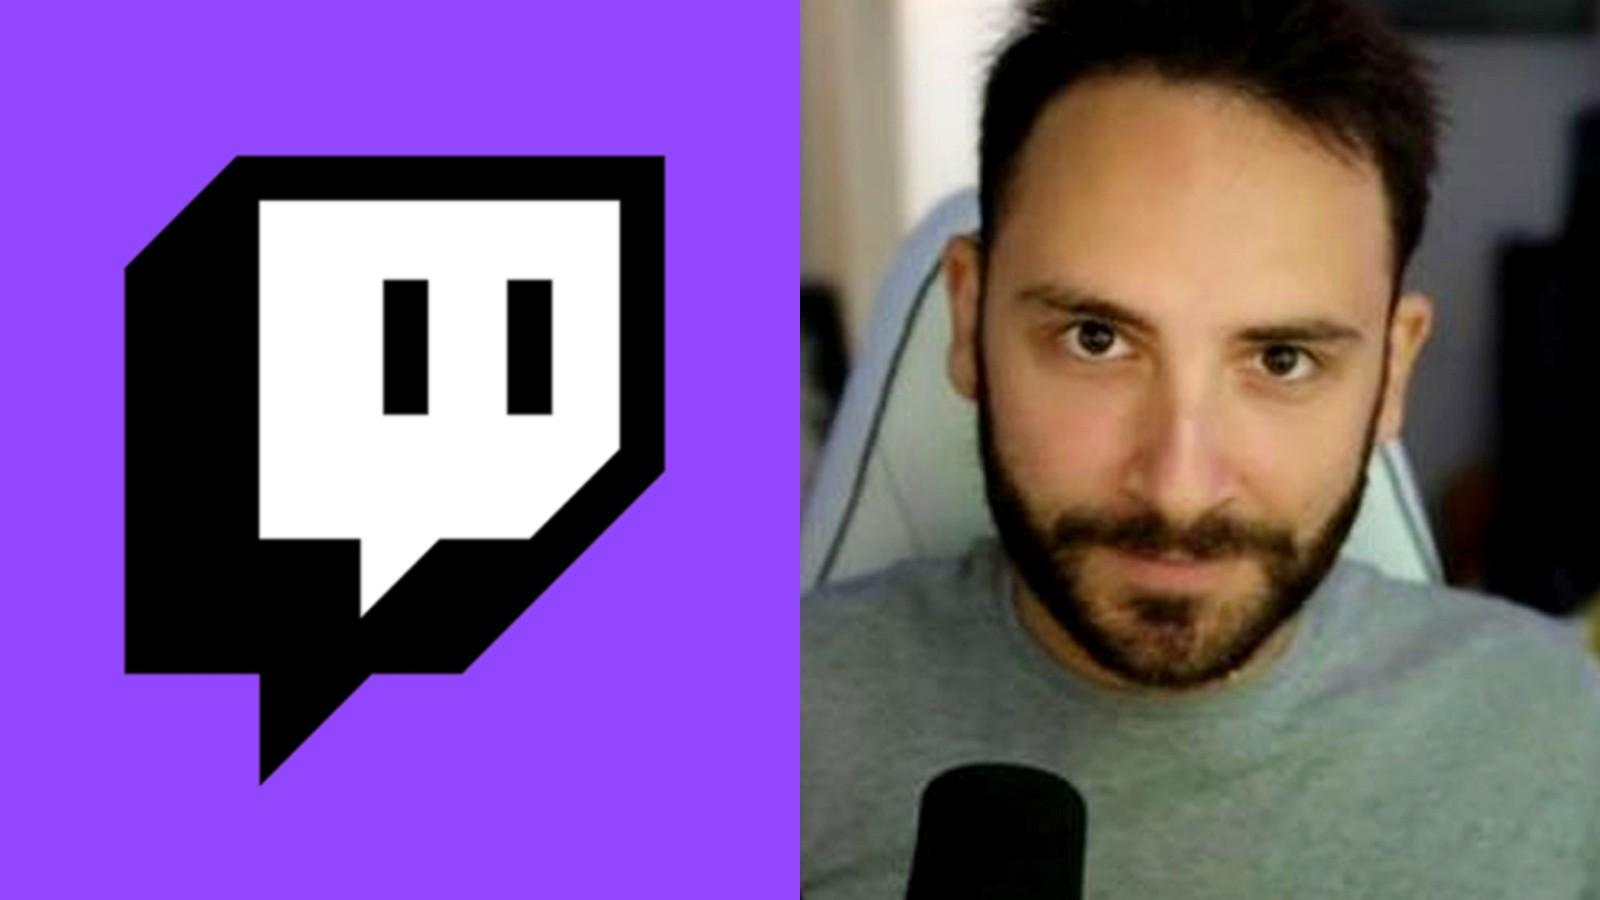 Image of the Twitch logo alongside Reckful